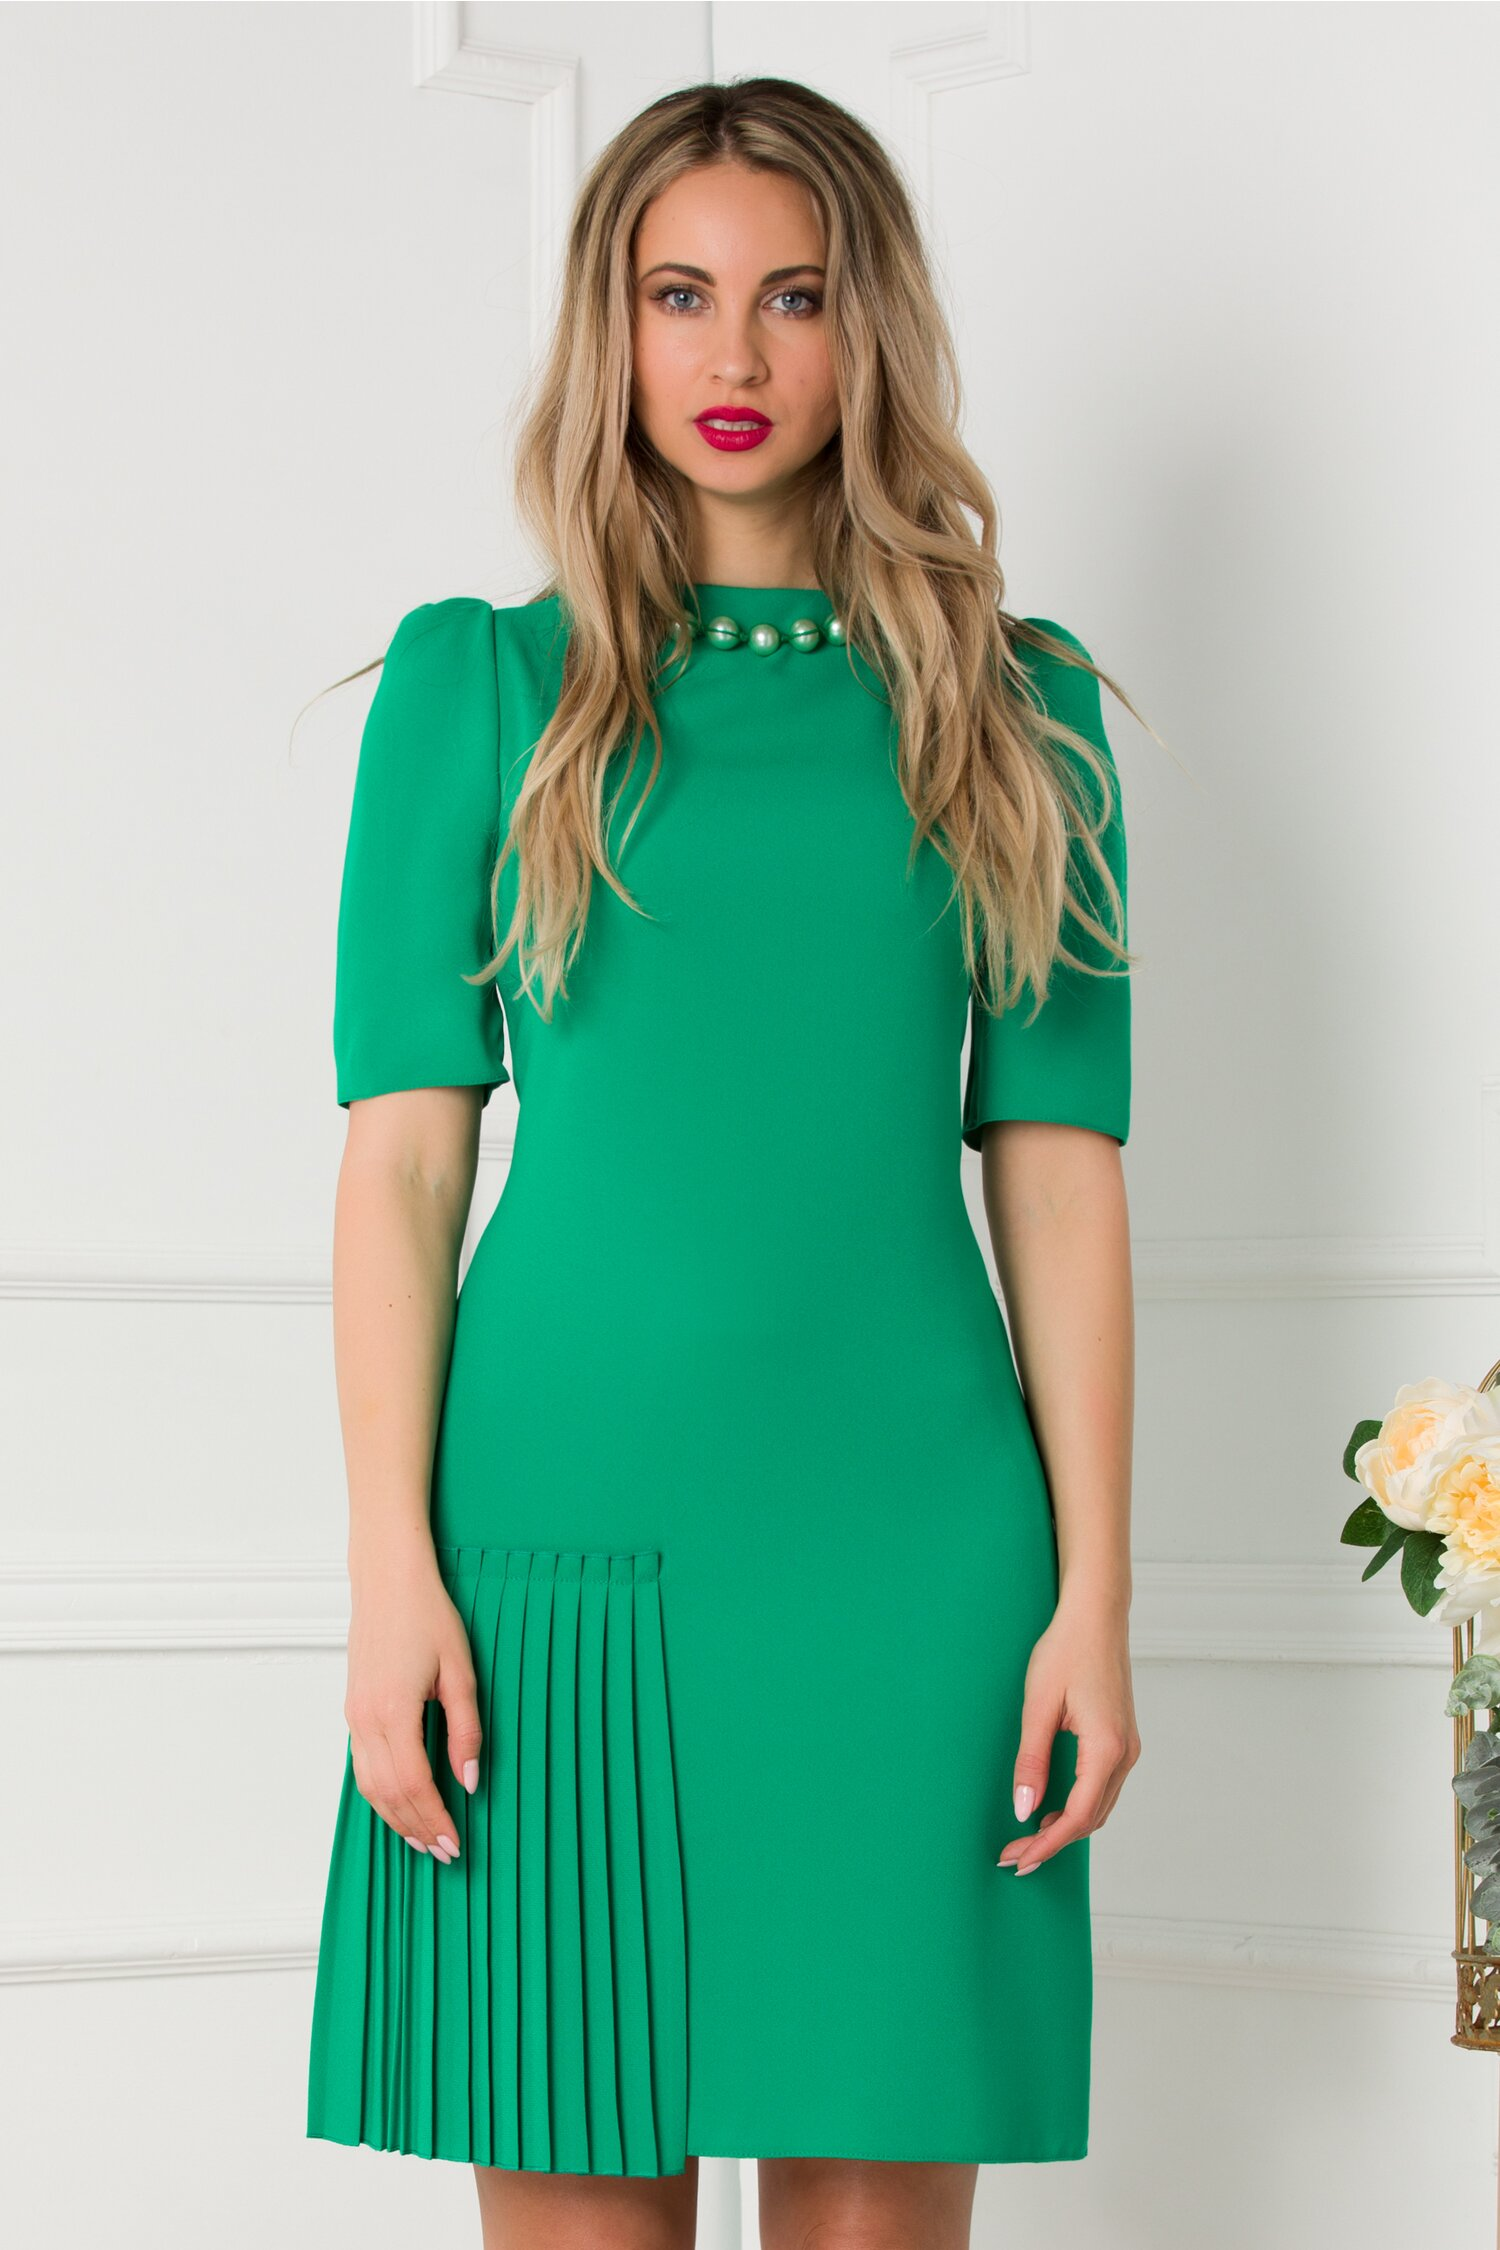 Rochie Deny verde accesorizata cu perle la decolteu